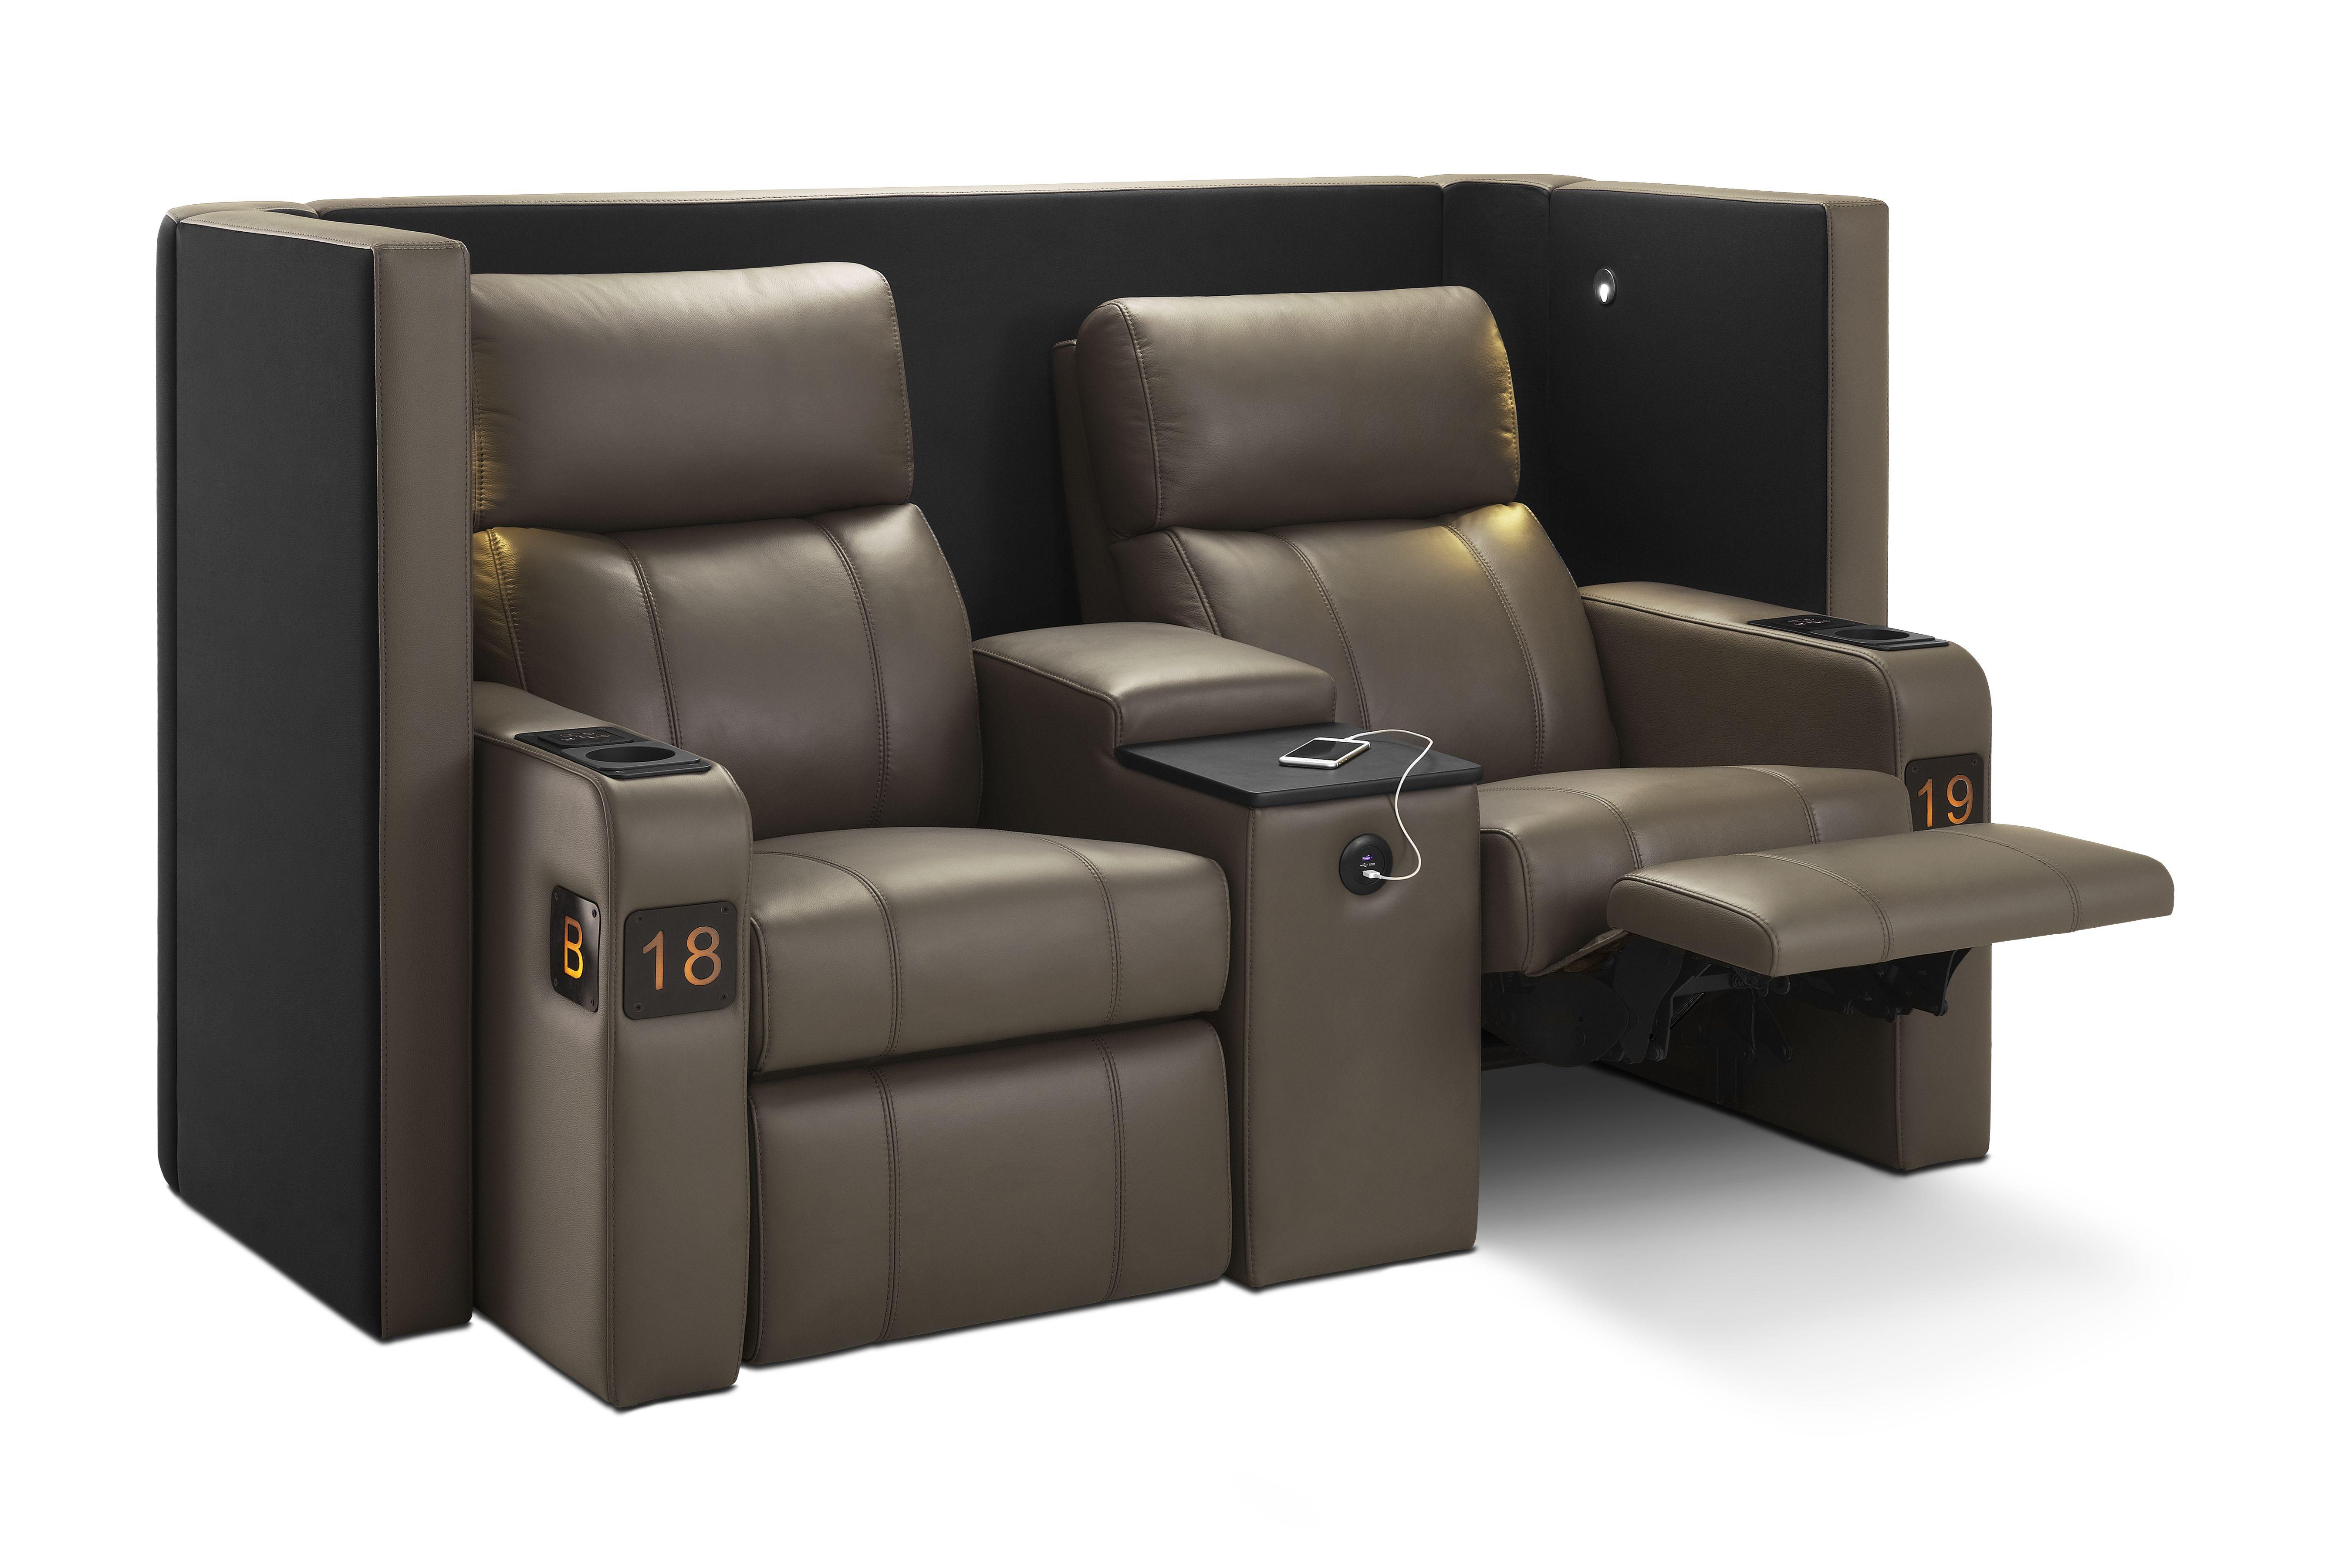 Verona Lite Vip Reclining Cinema Seating With Wrap Around Privacy